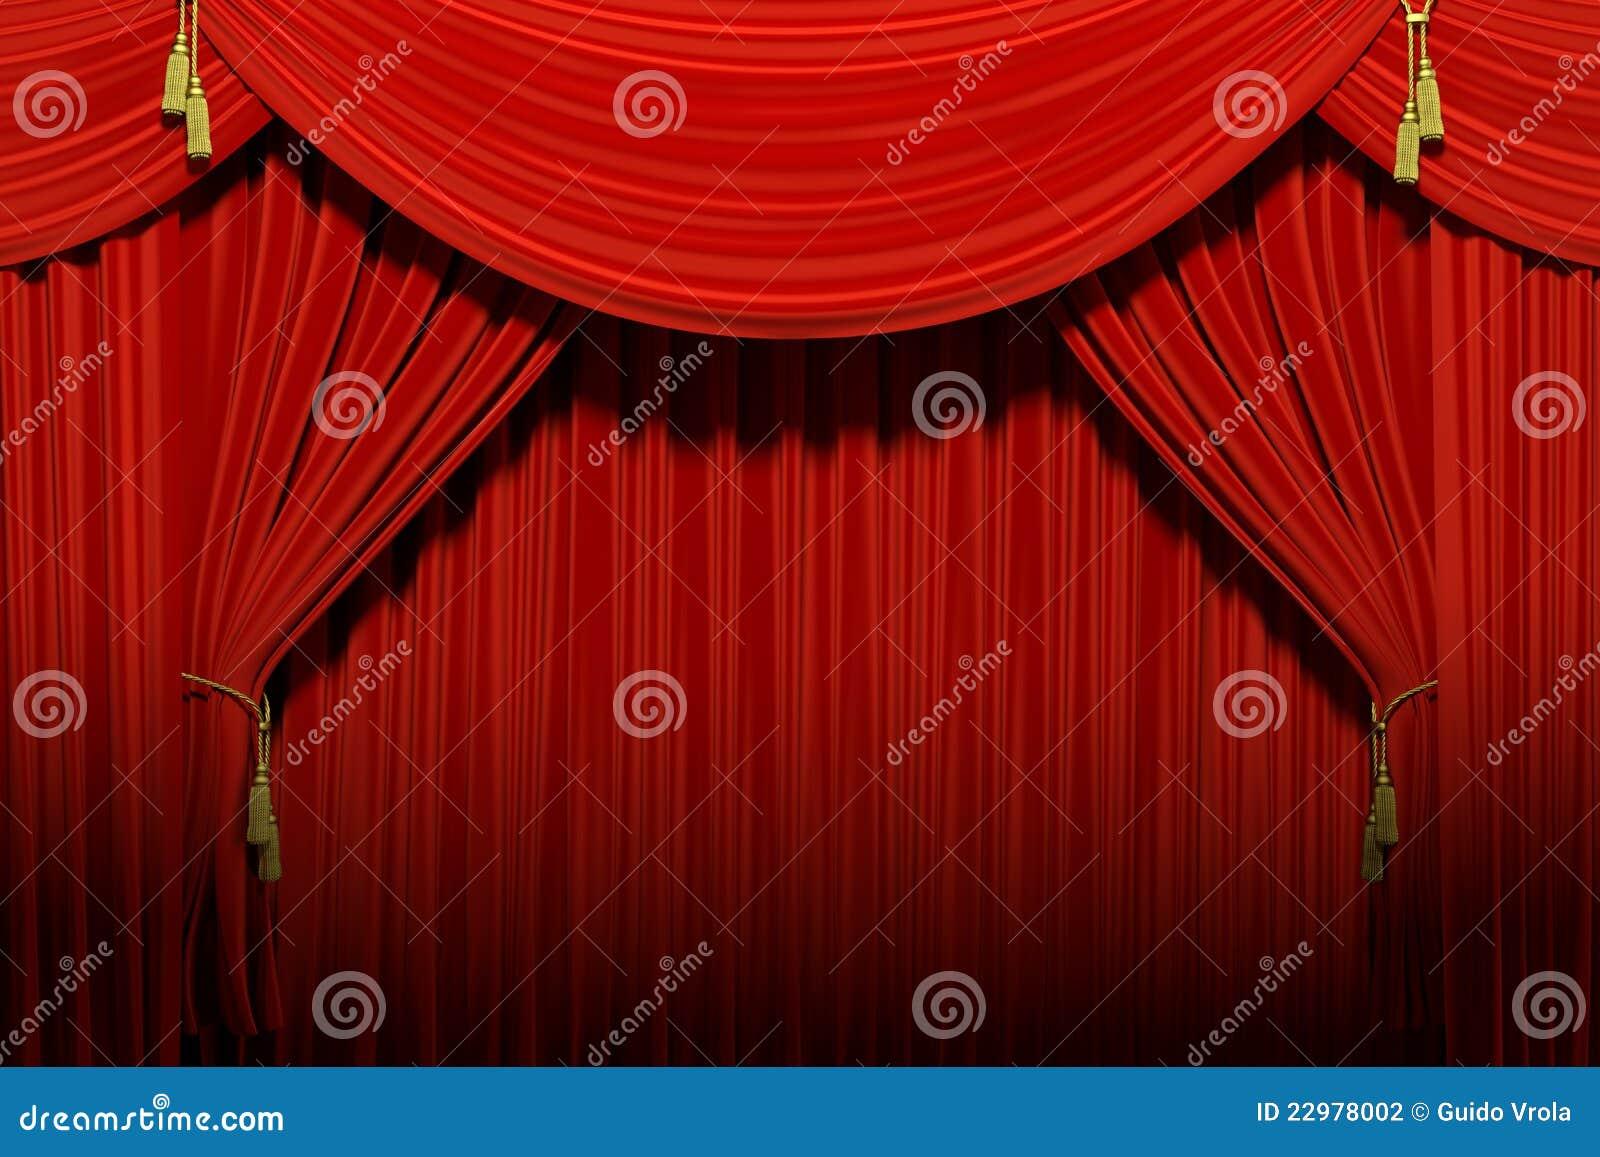 drapes red stage theater velvet